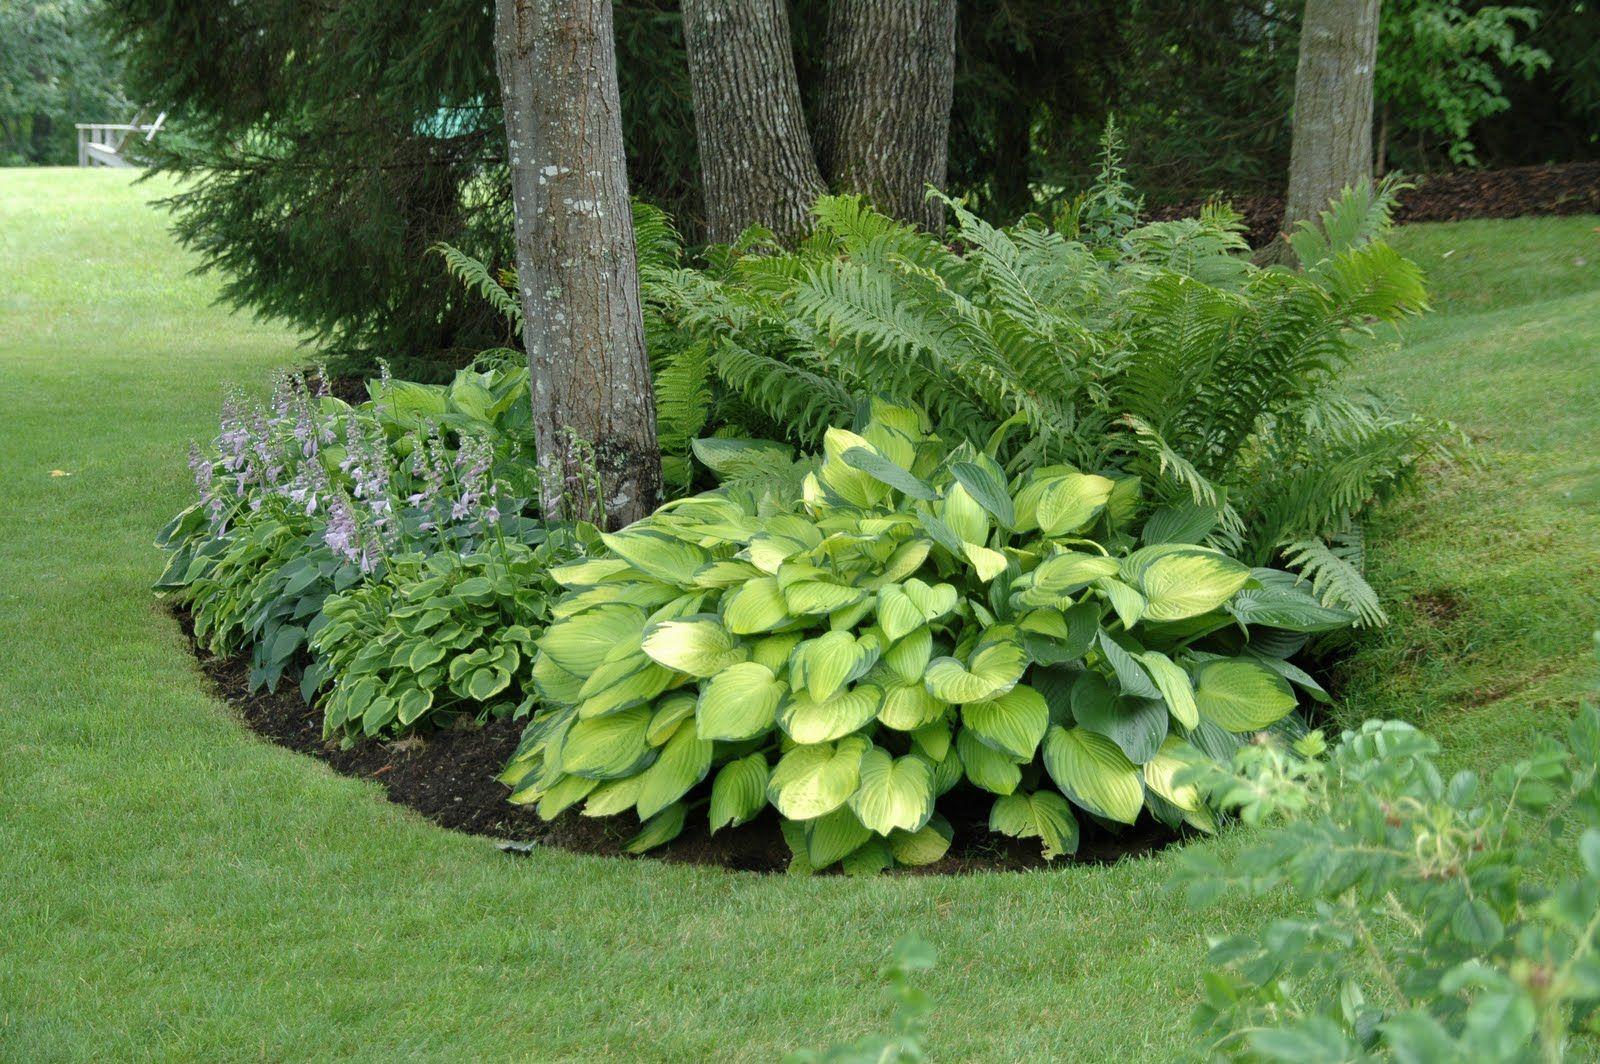 Hosta Edging Outdoors Garden Garden Landscaping